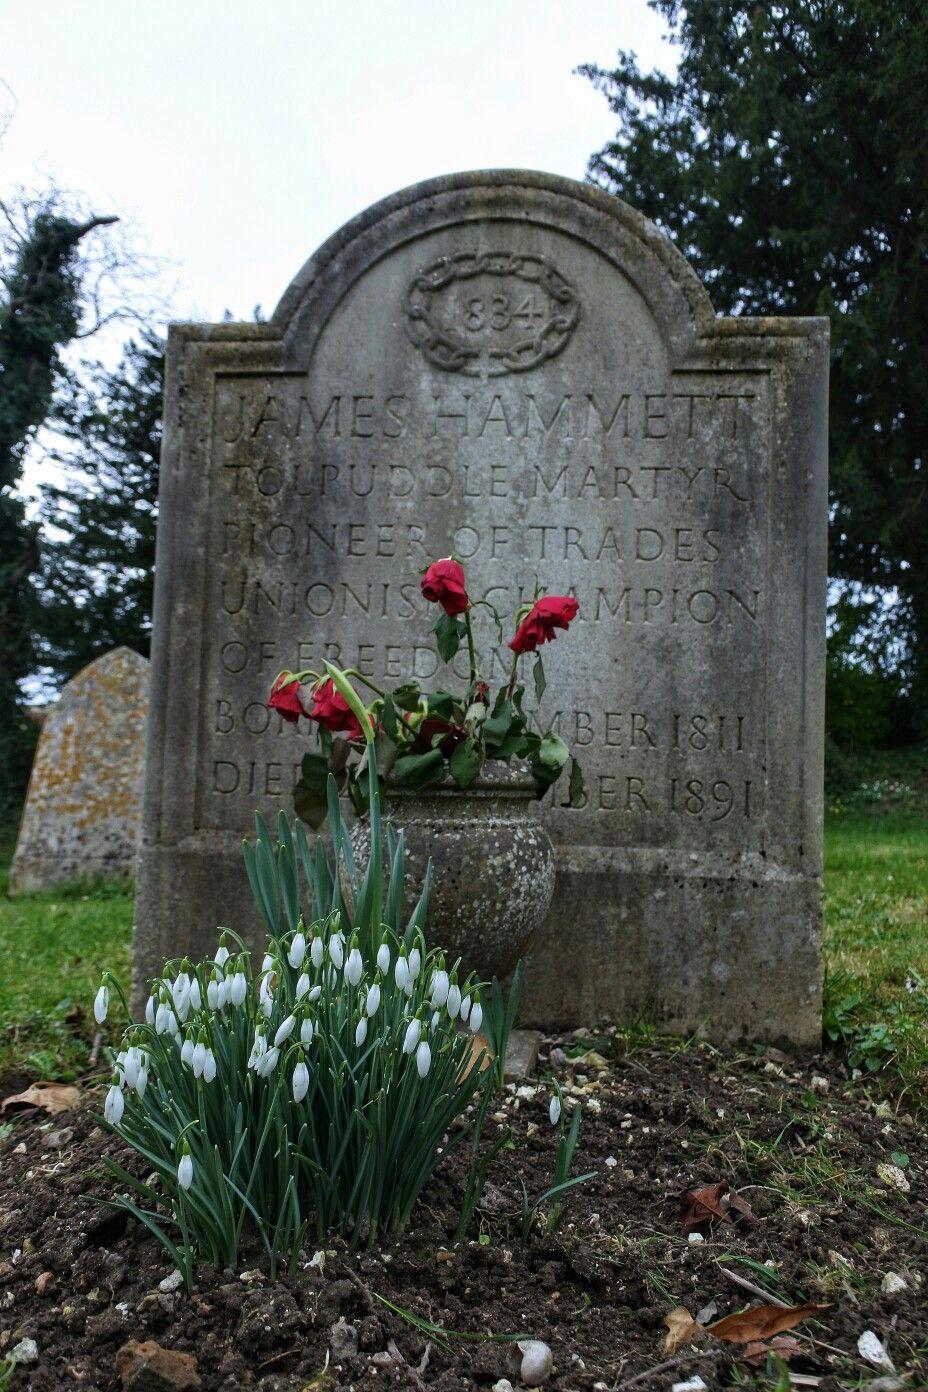 James hammett grave tolpuddle historic england village